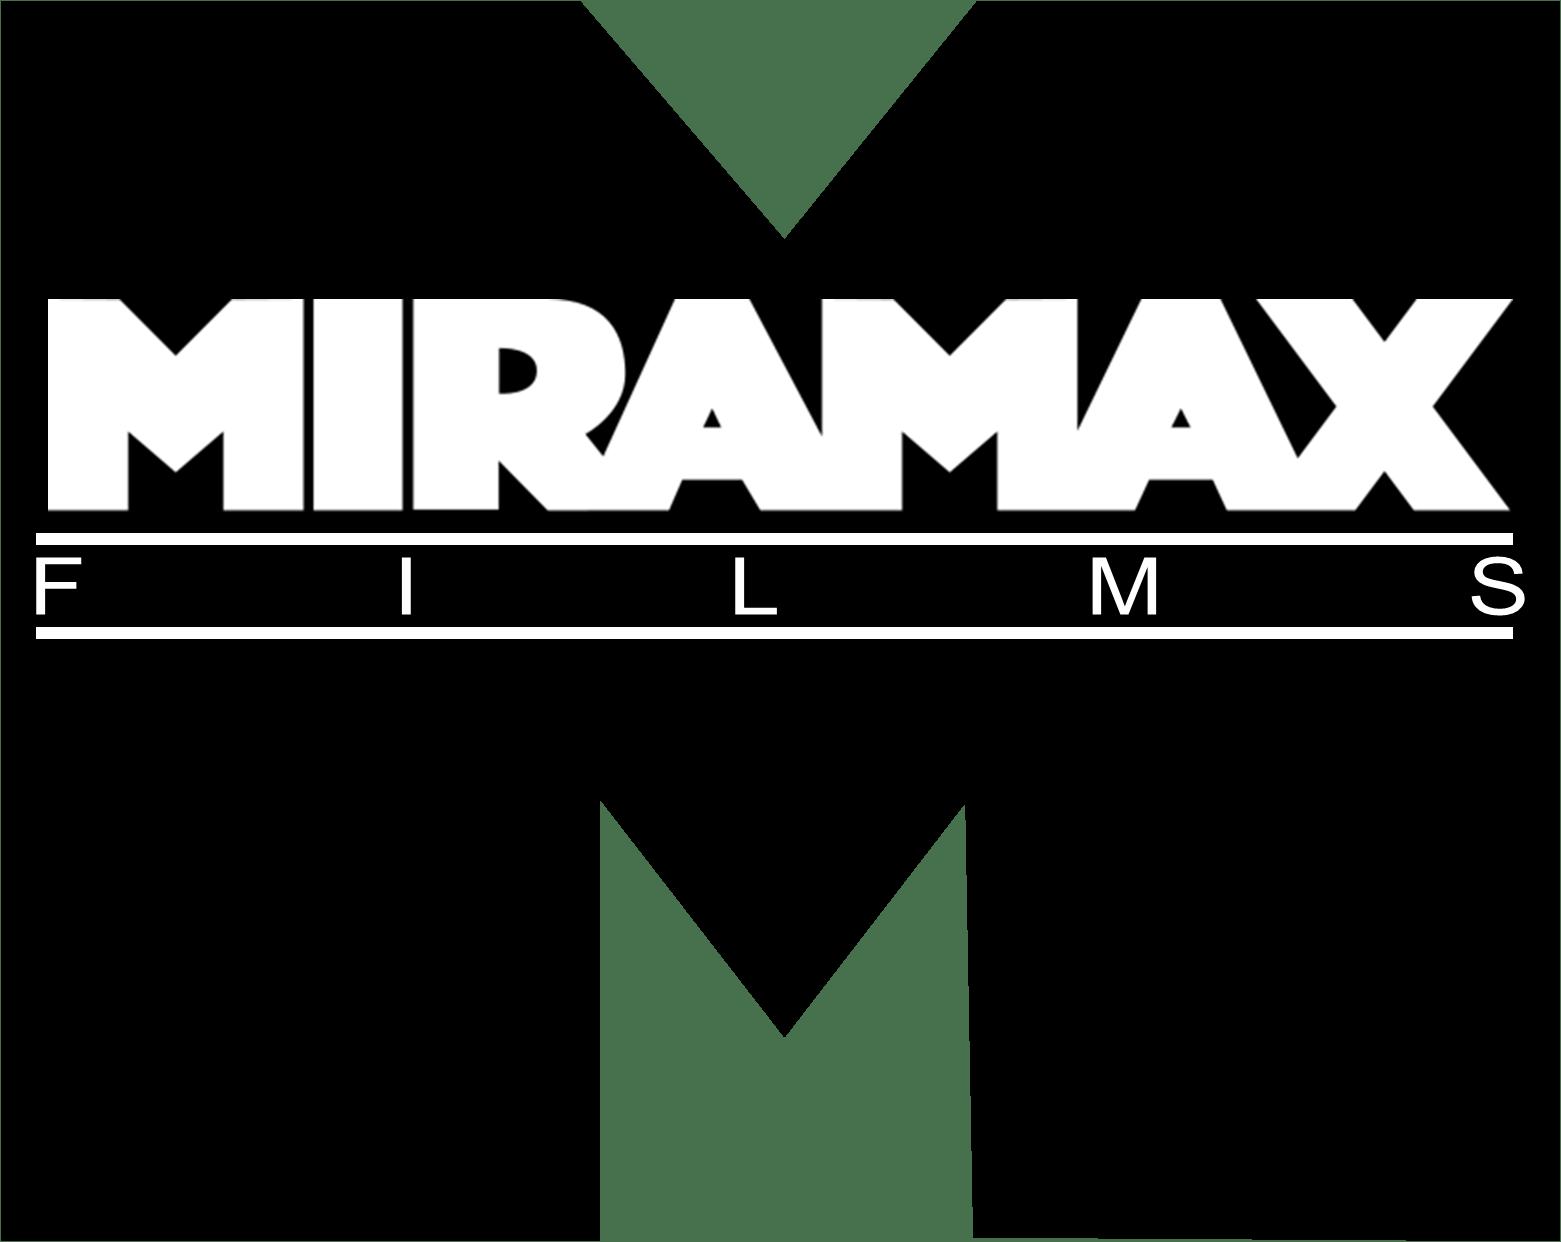 Miramax_1987_Print_Logo